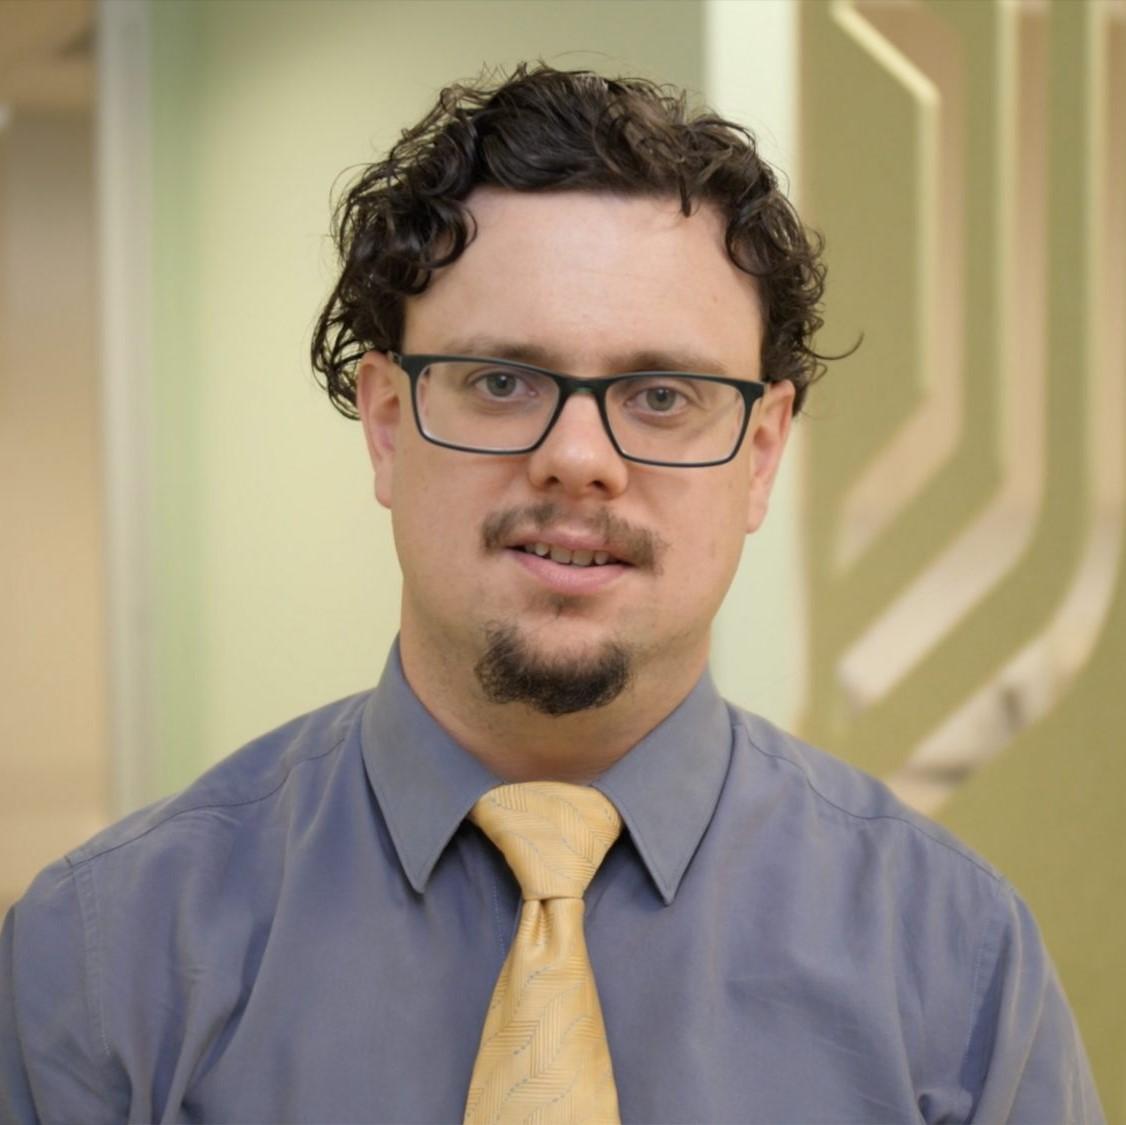 Profile of Tim Macready, Chief Investment Officer, Brightlight